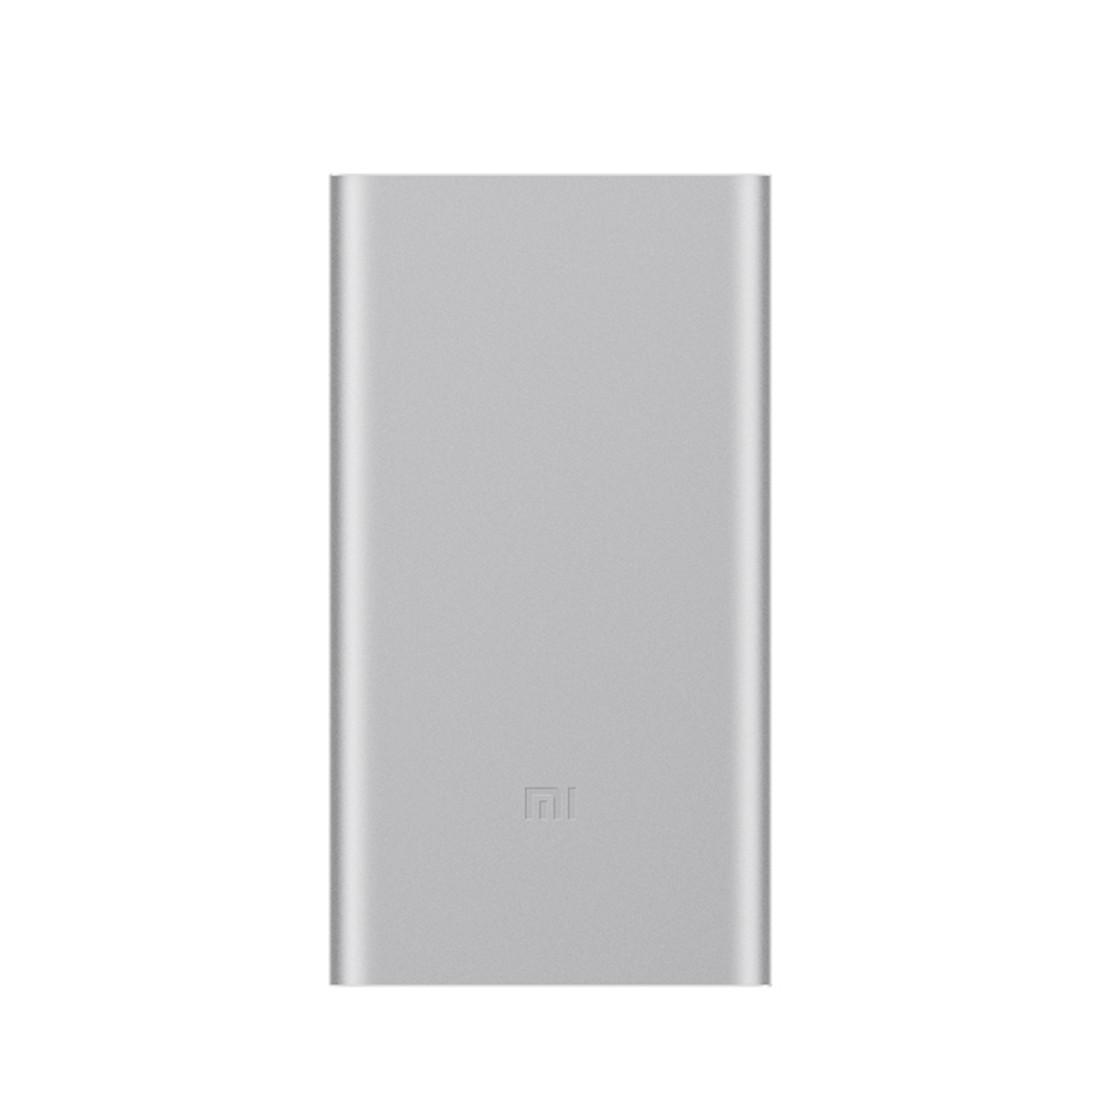 Портативное зарядное устройство, Xiaomi, Mi Power Bank 10000 mAh Pro 2  VXN4179CN, Выход USB: 1*2.1A